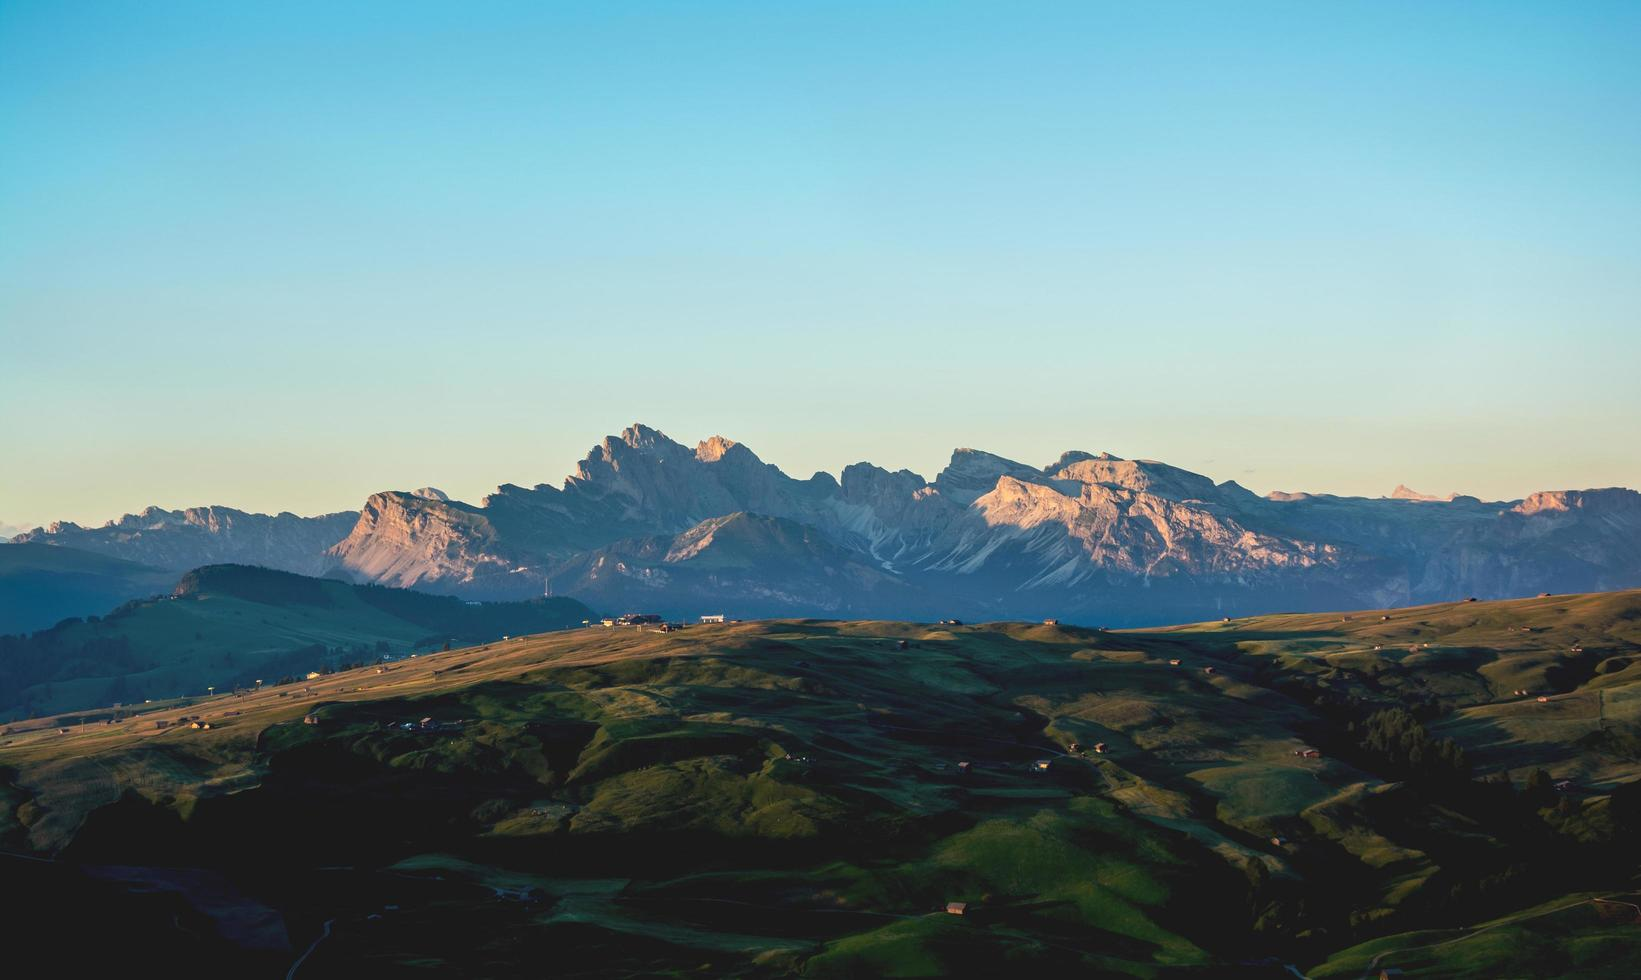 Schlern mountain in Italy photo